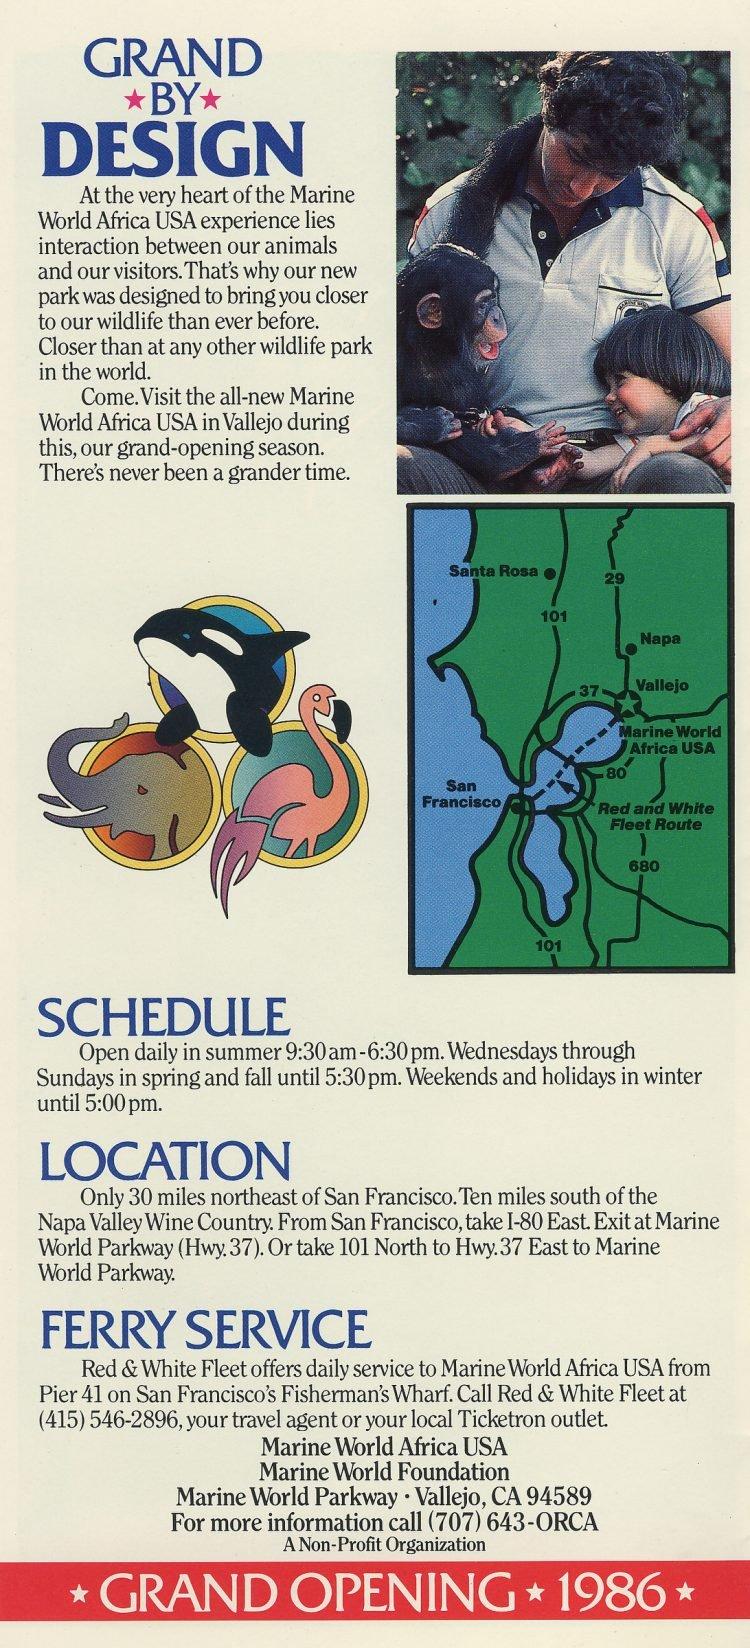 Marine World Africa USA - Grand Opening brochure 1986 (5)